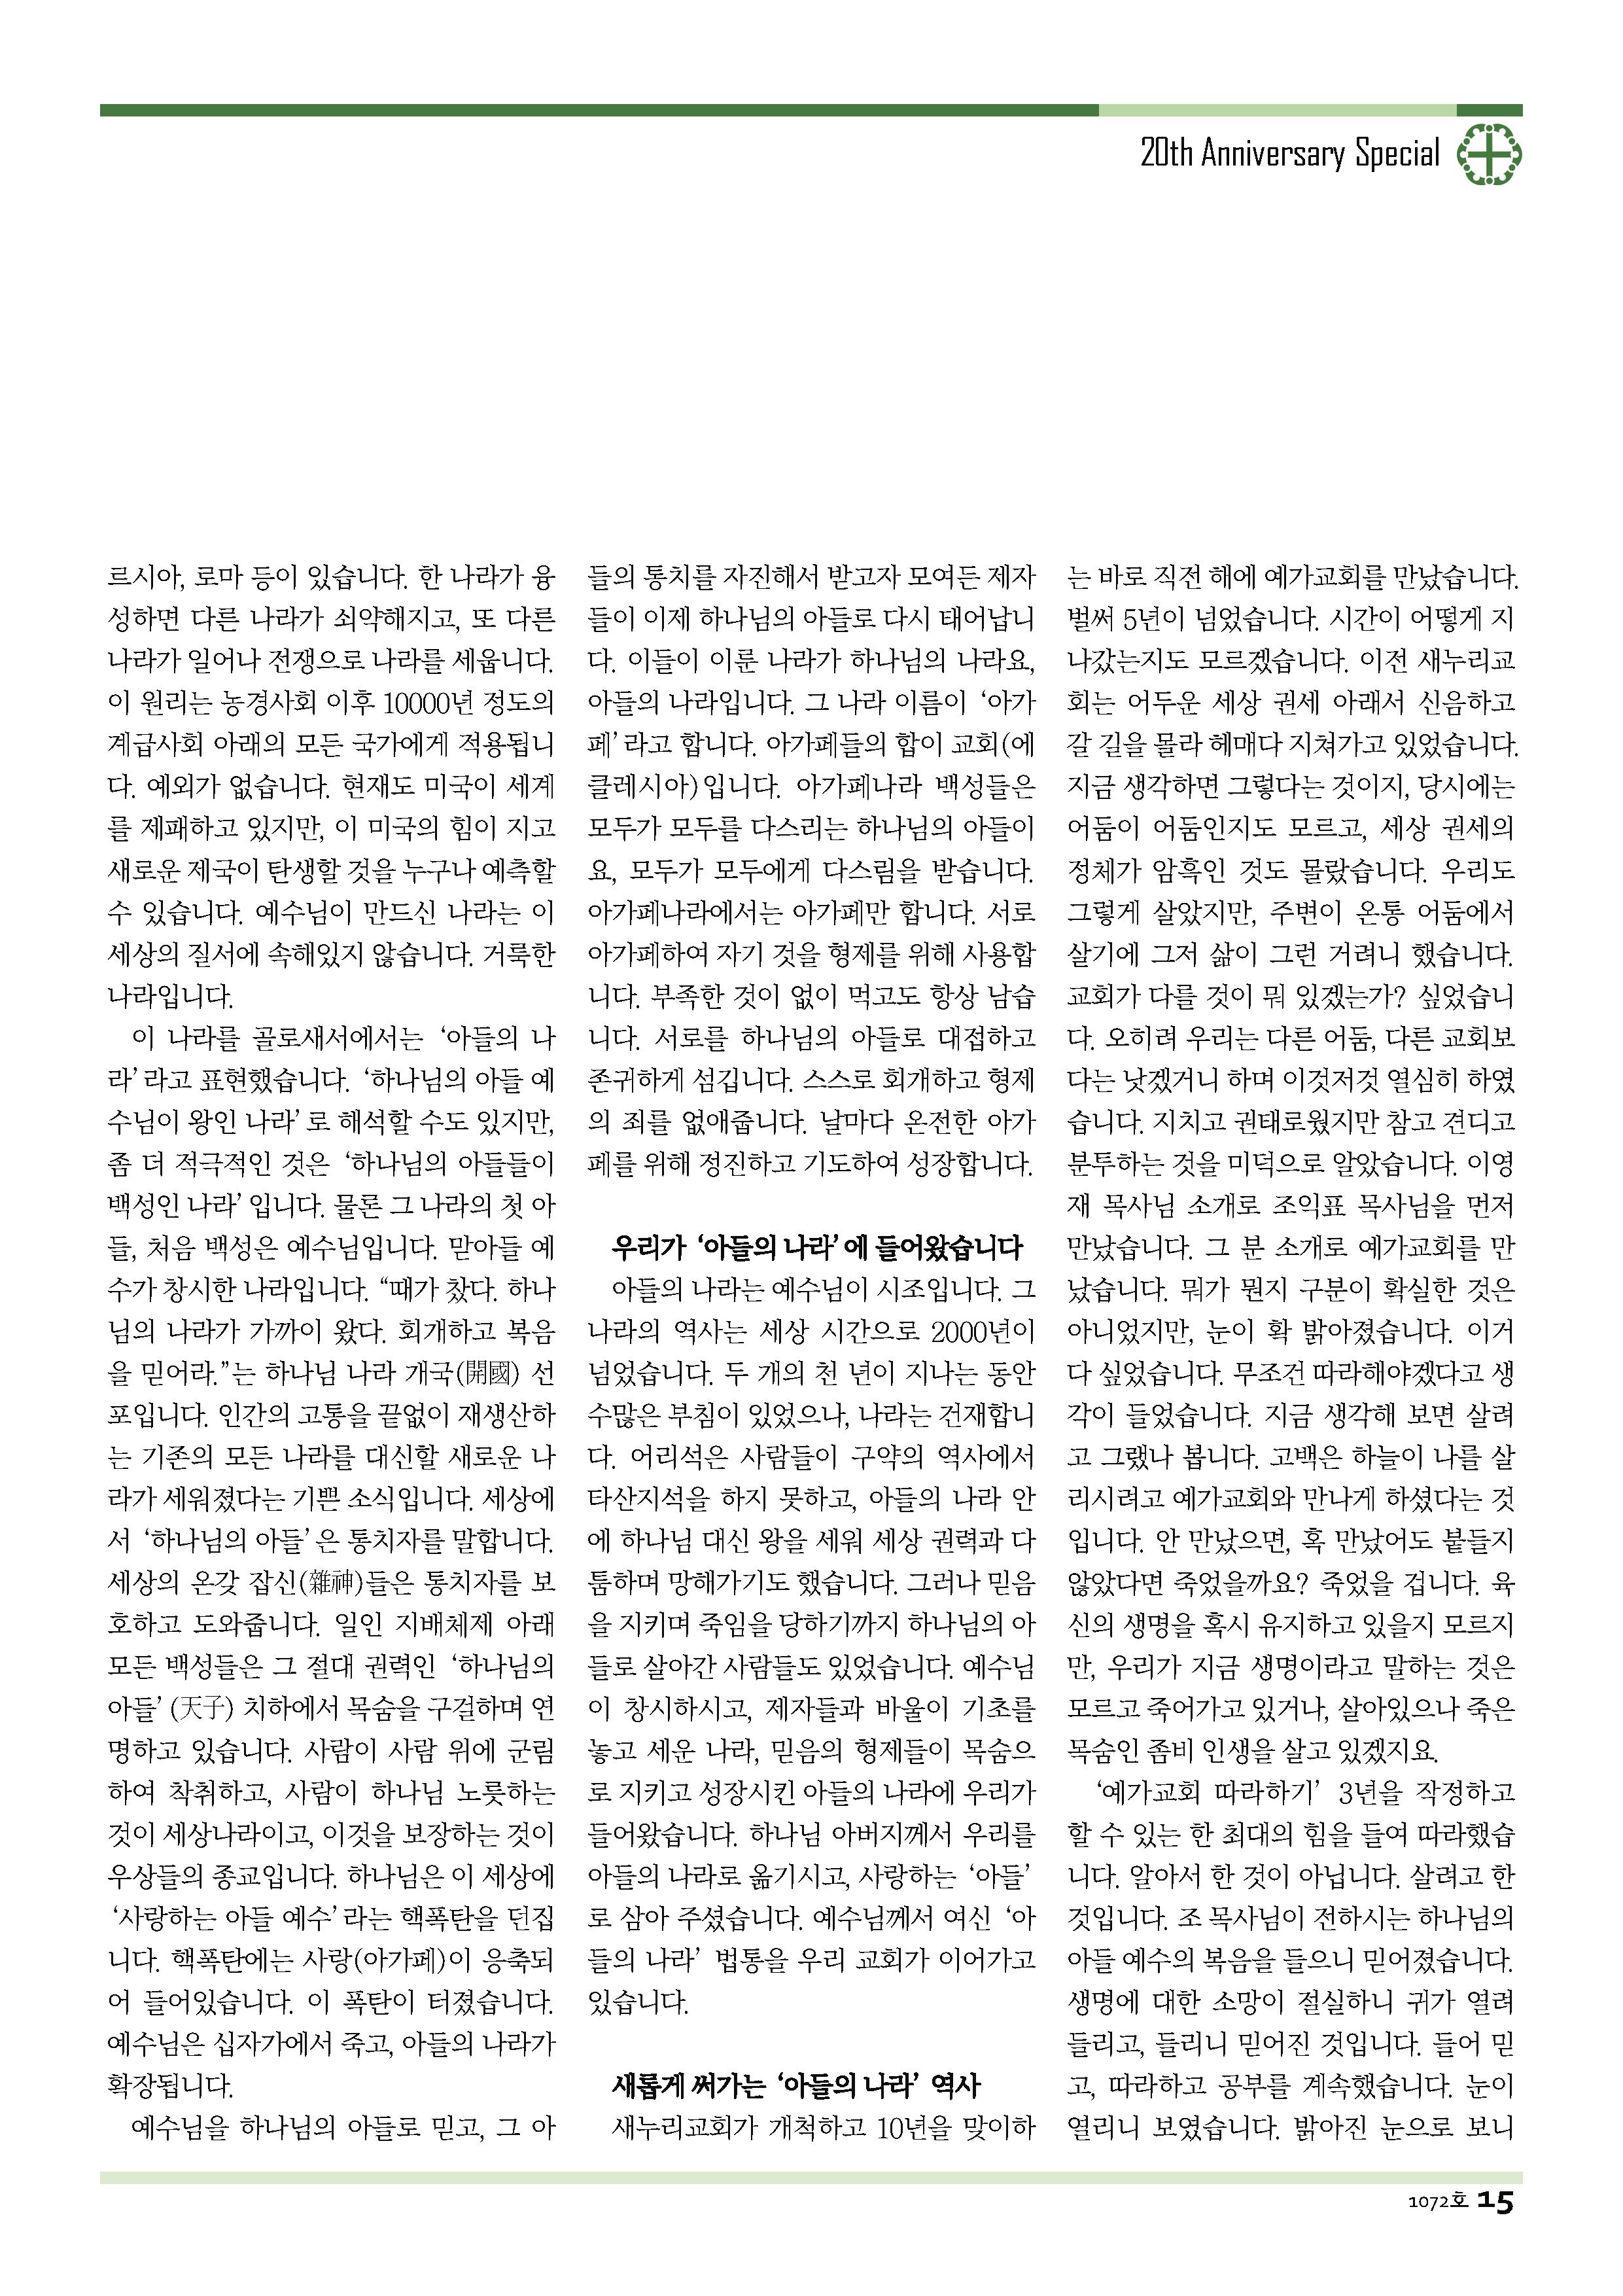 18sdjb0909_페이지_15.png